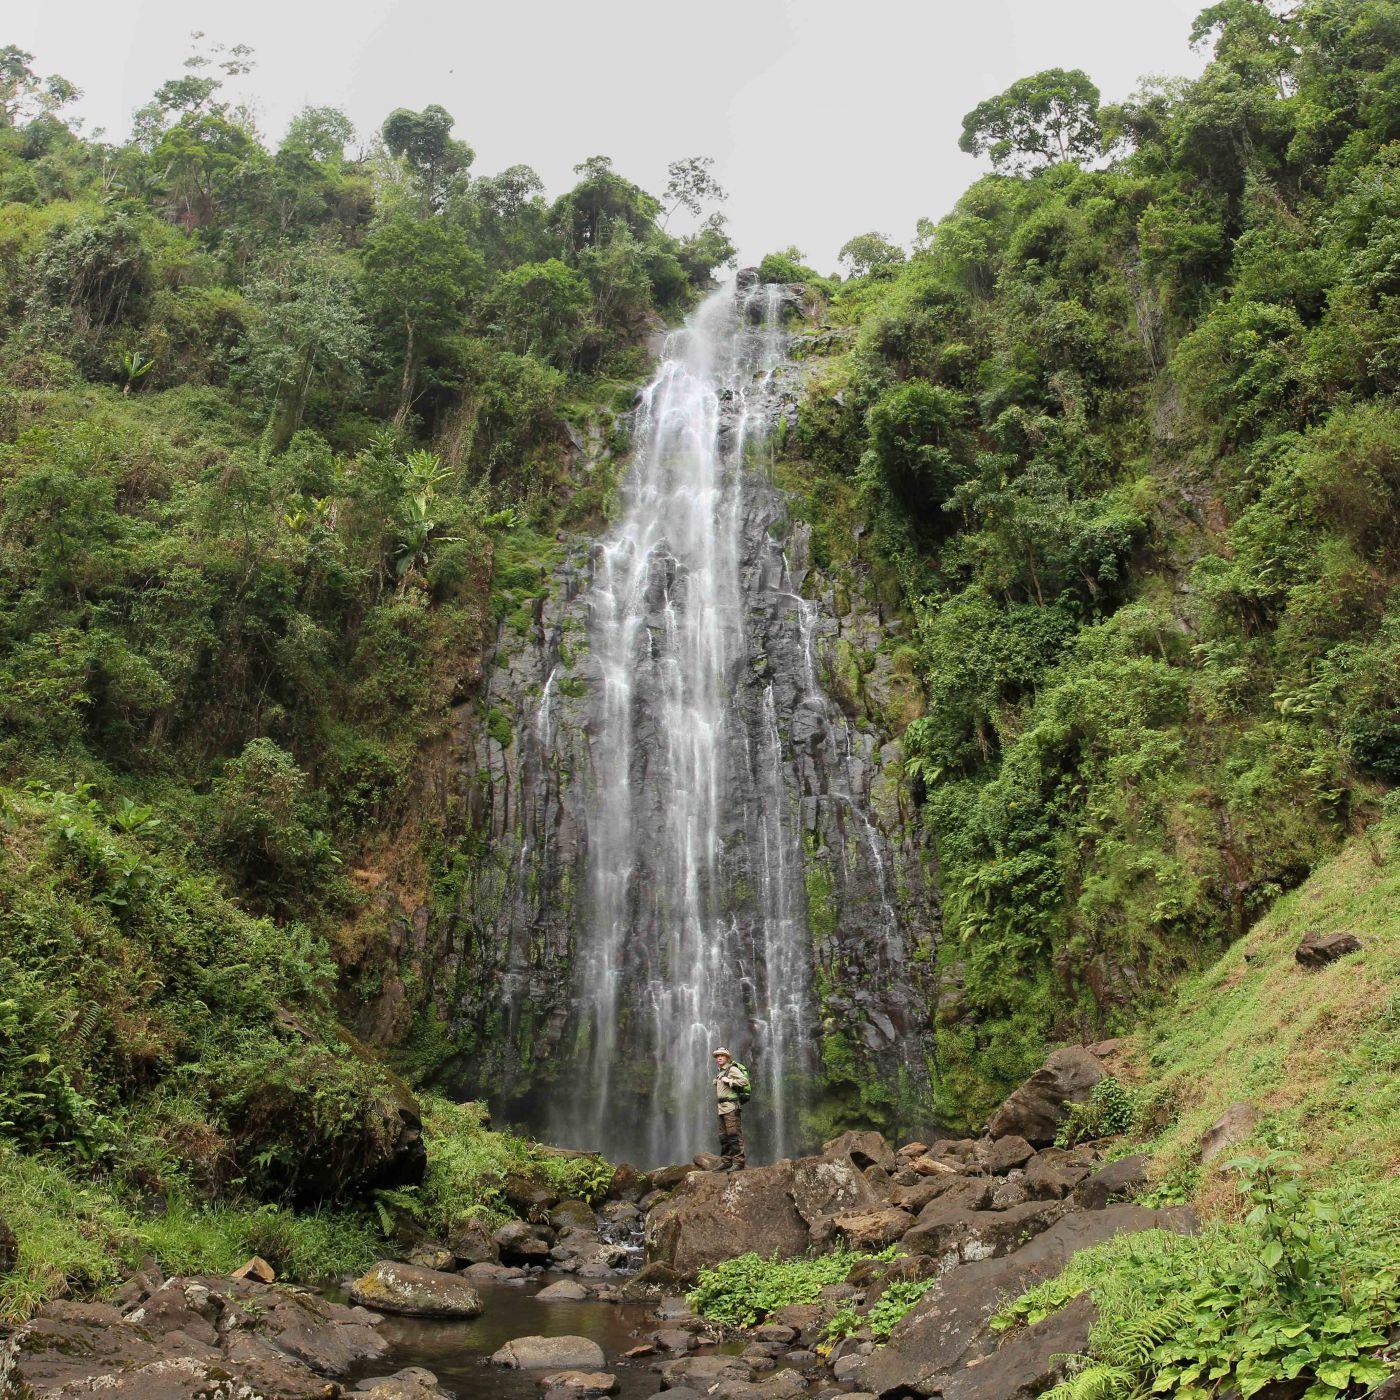 Materuni Jungle-Waterfalls near Kilimanjaro, Tanzania